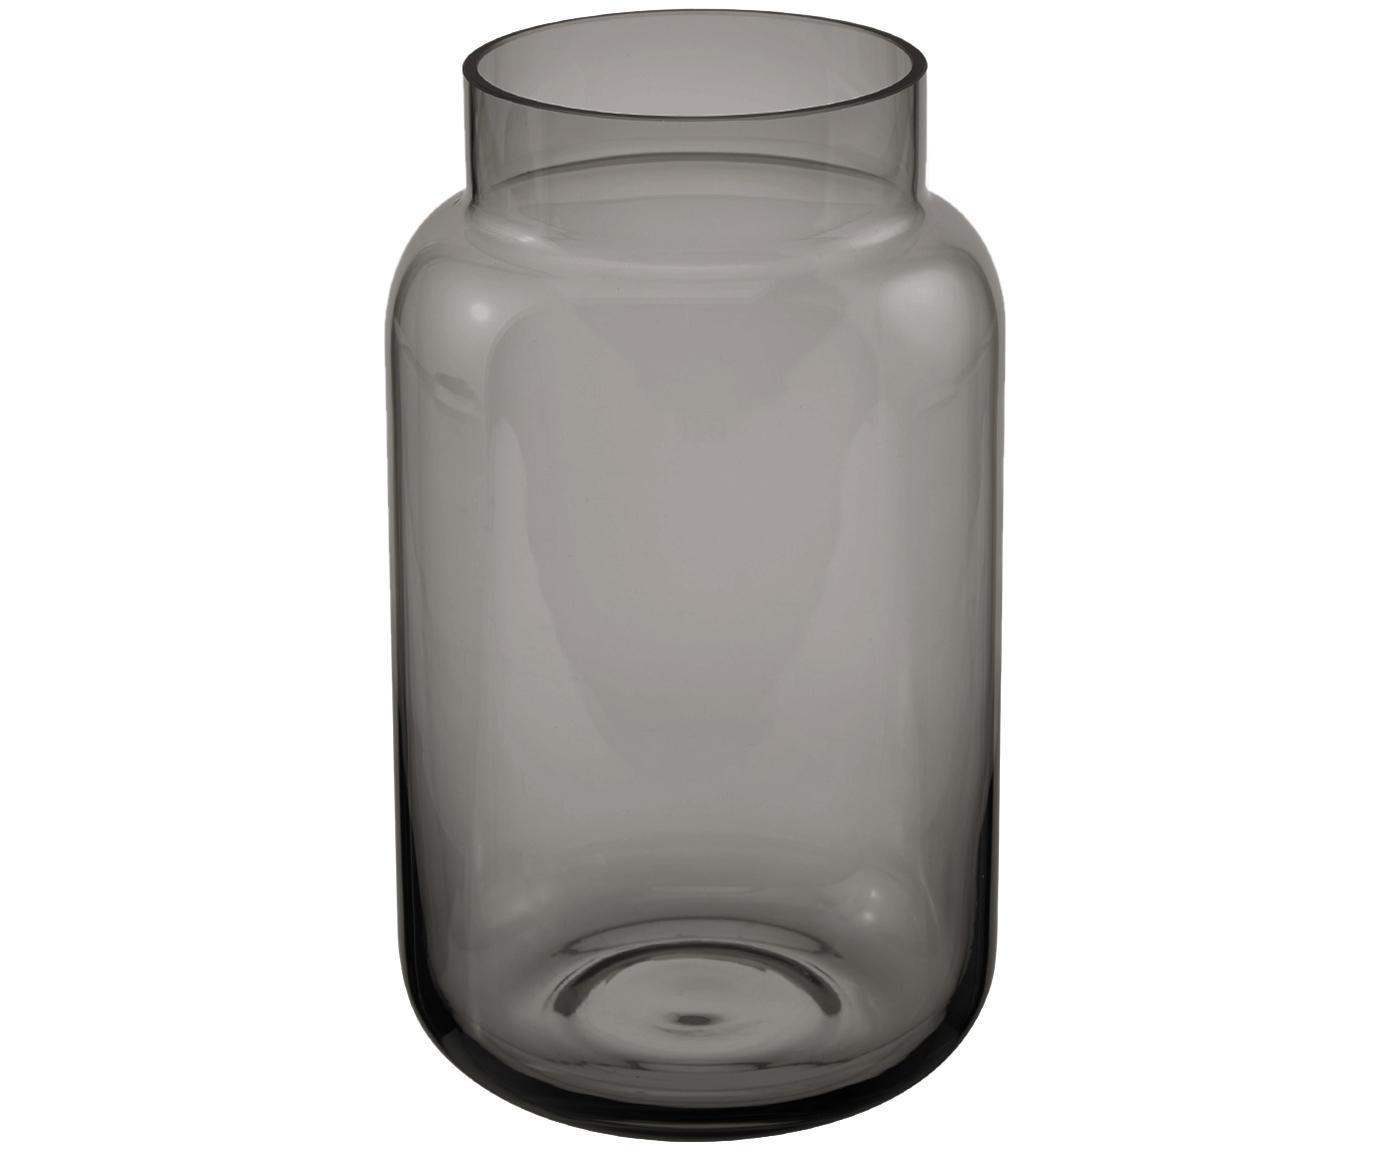 Glas-Vase Lasse, groß, Glas, Grau, transparent, ∅ 13 x H 22 cm